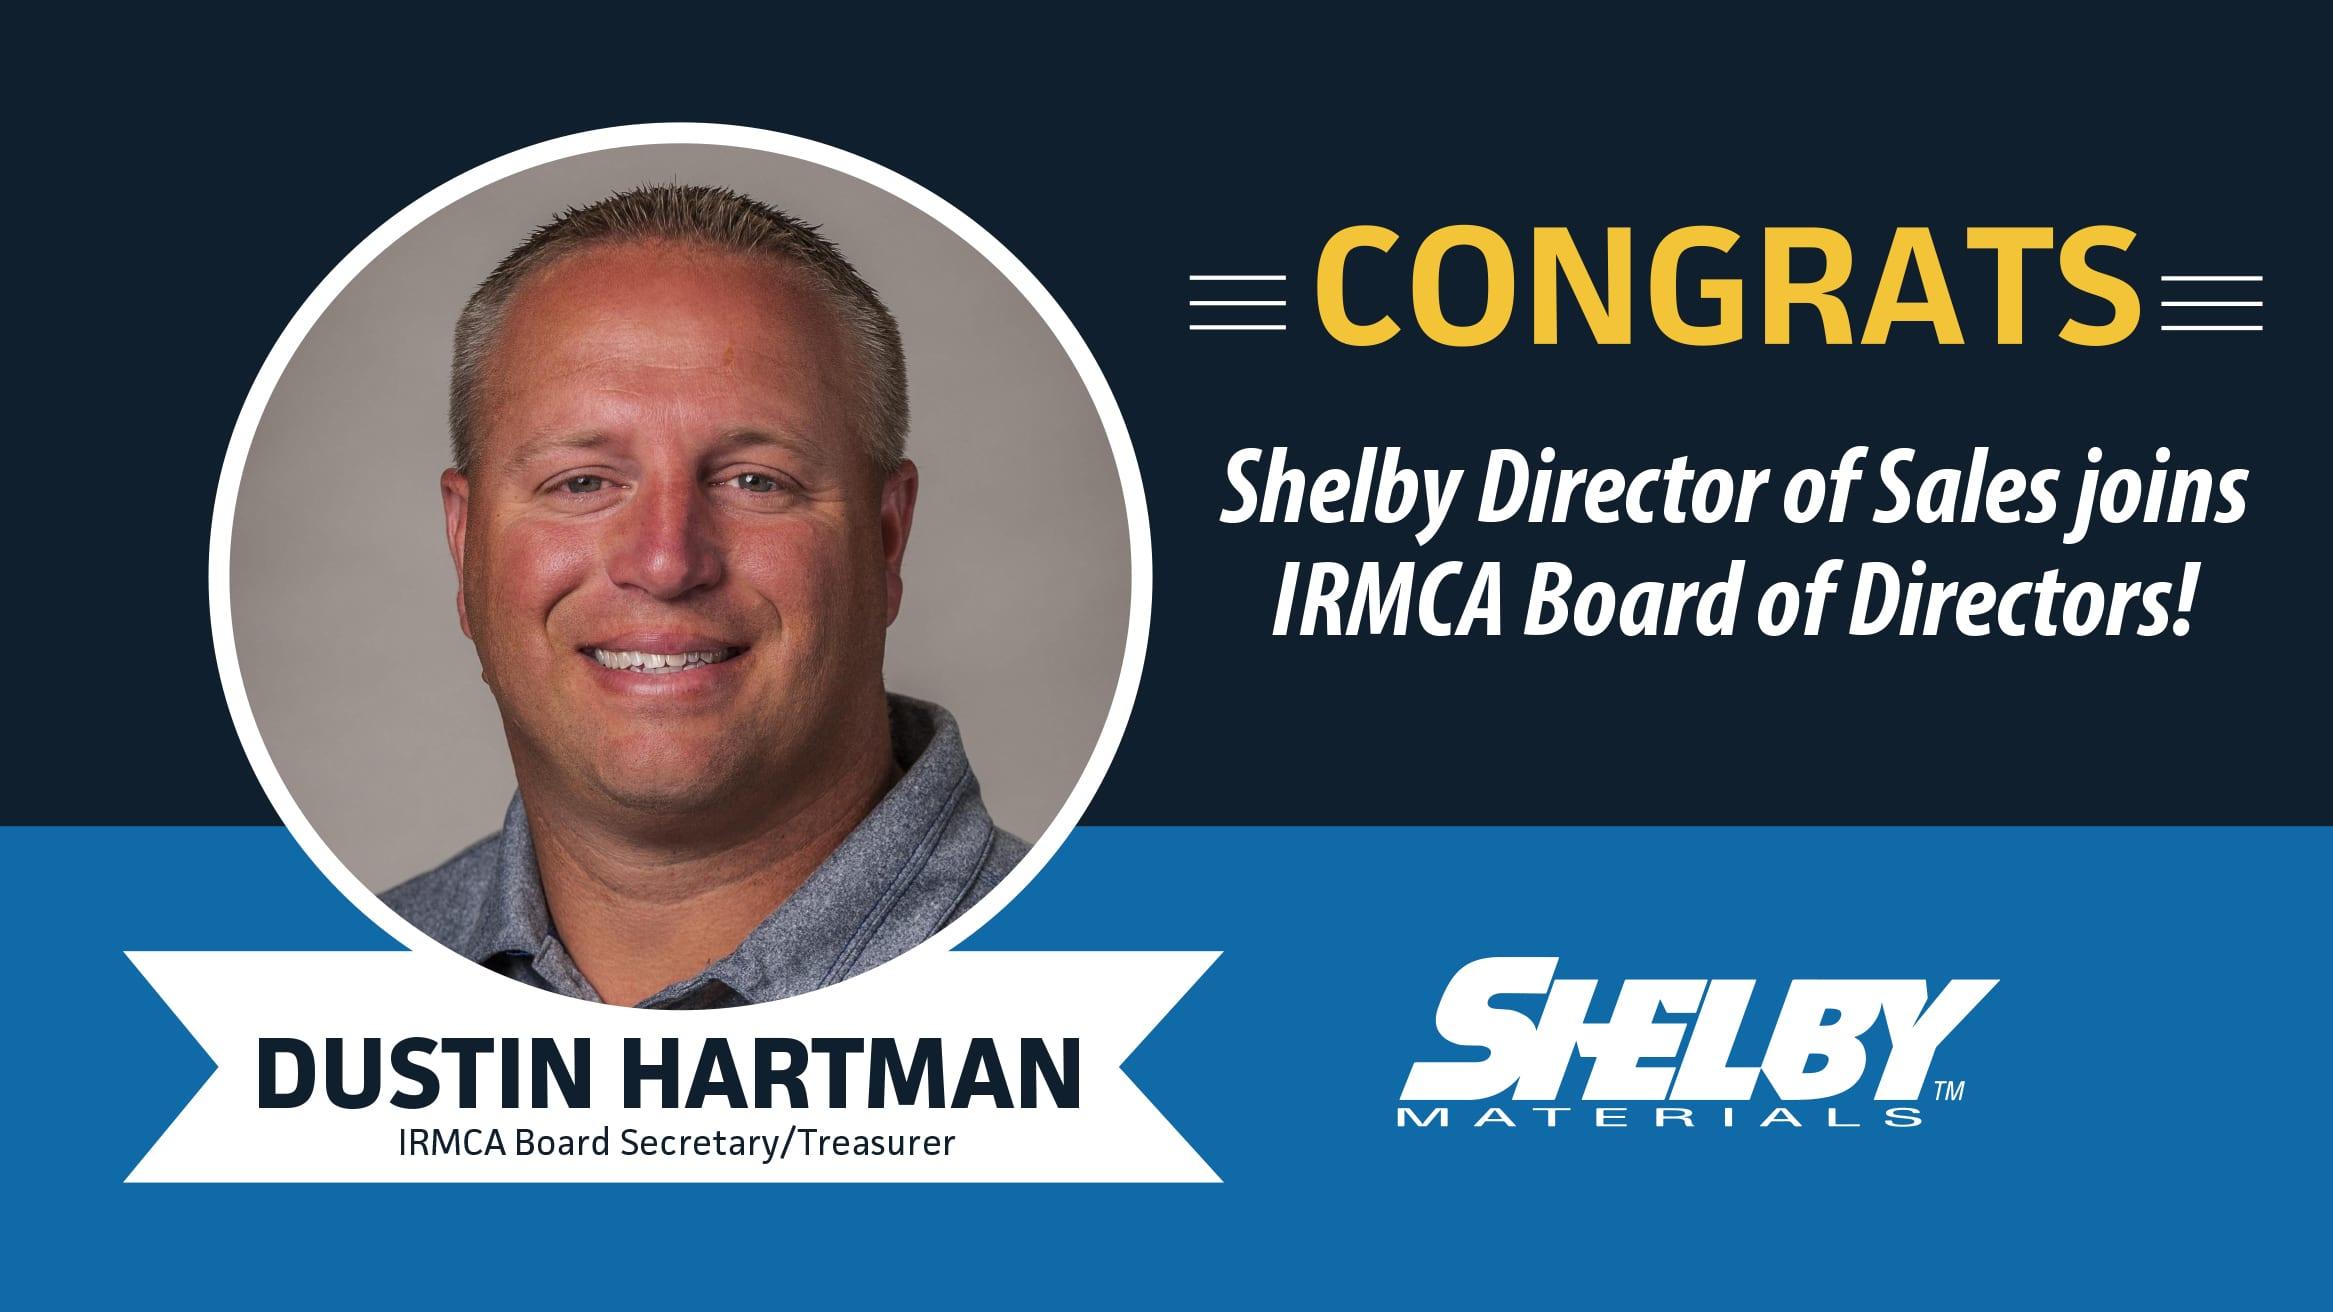 Director of Sales Joins IRMCA Board